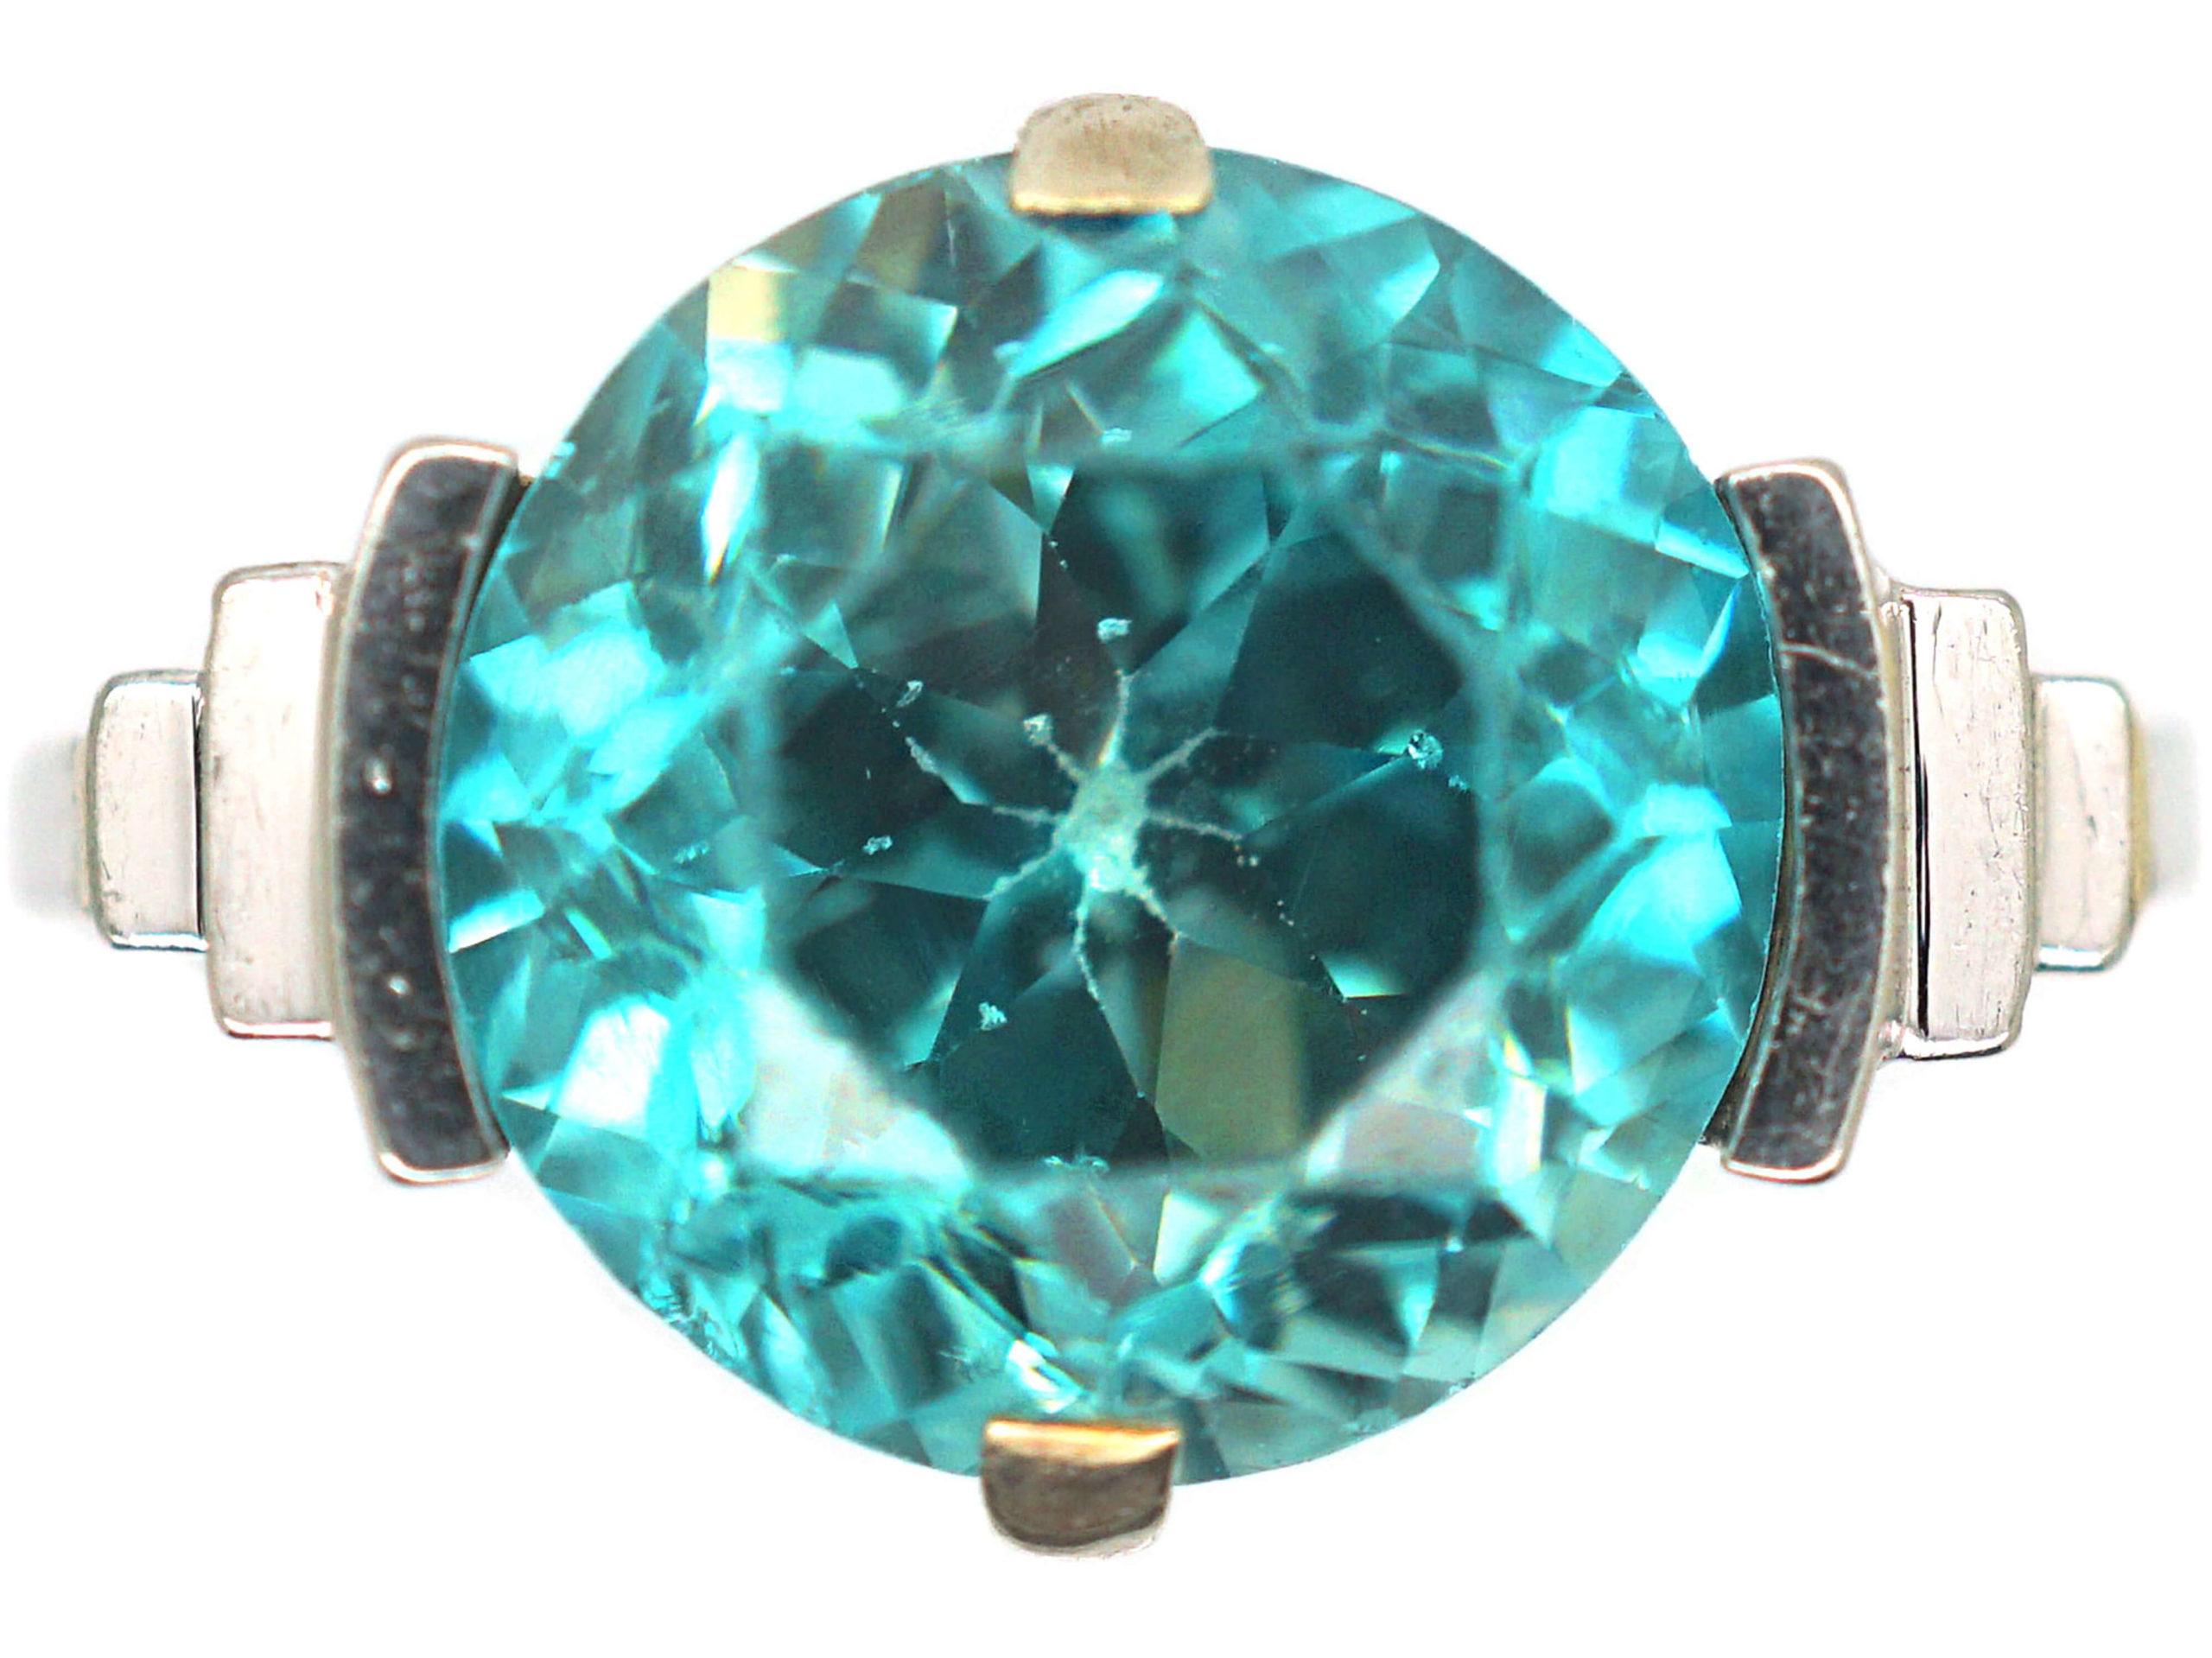 Art Deco 18ct White Gold Zircon Ring